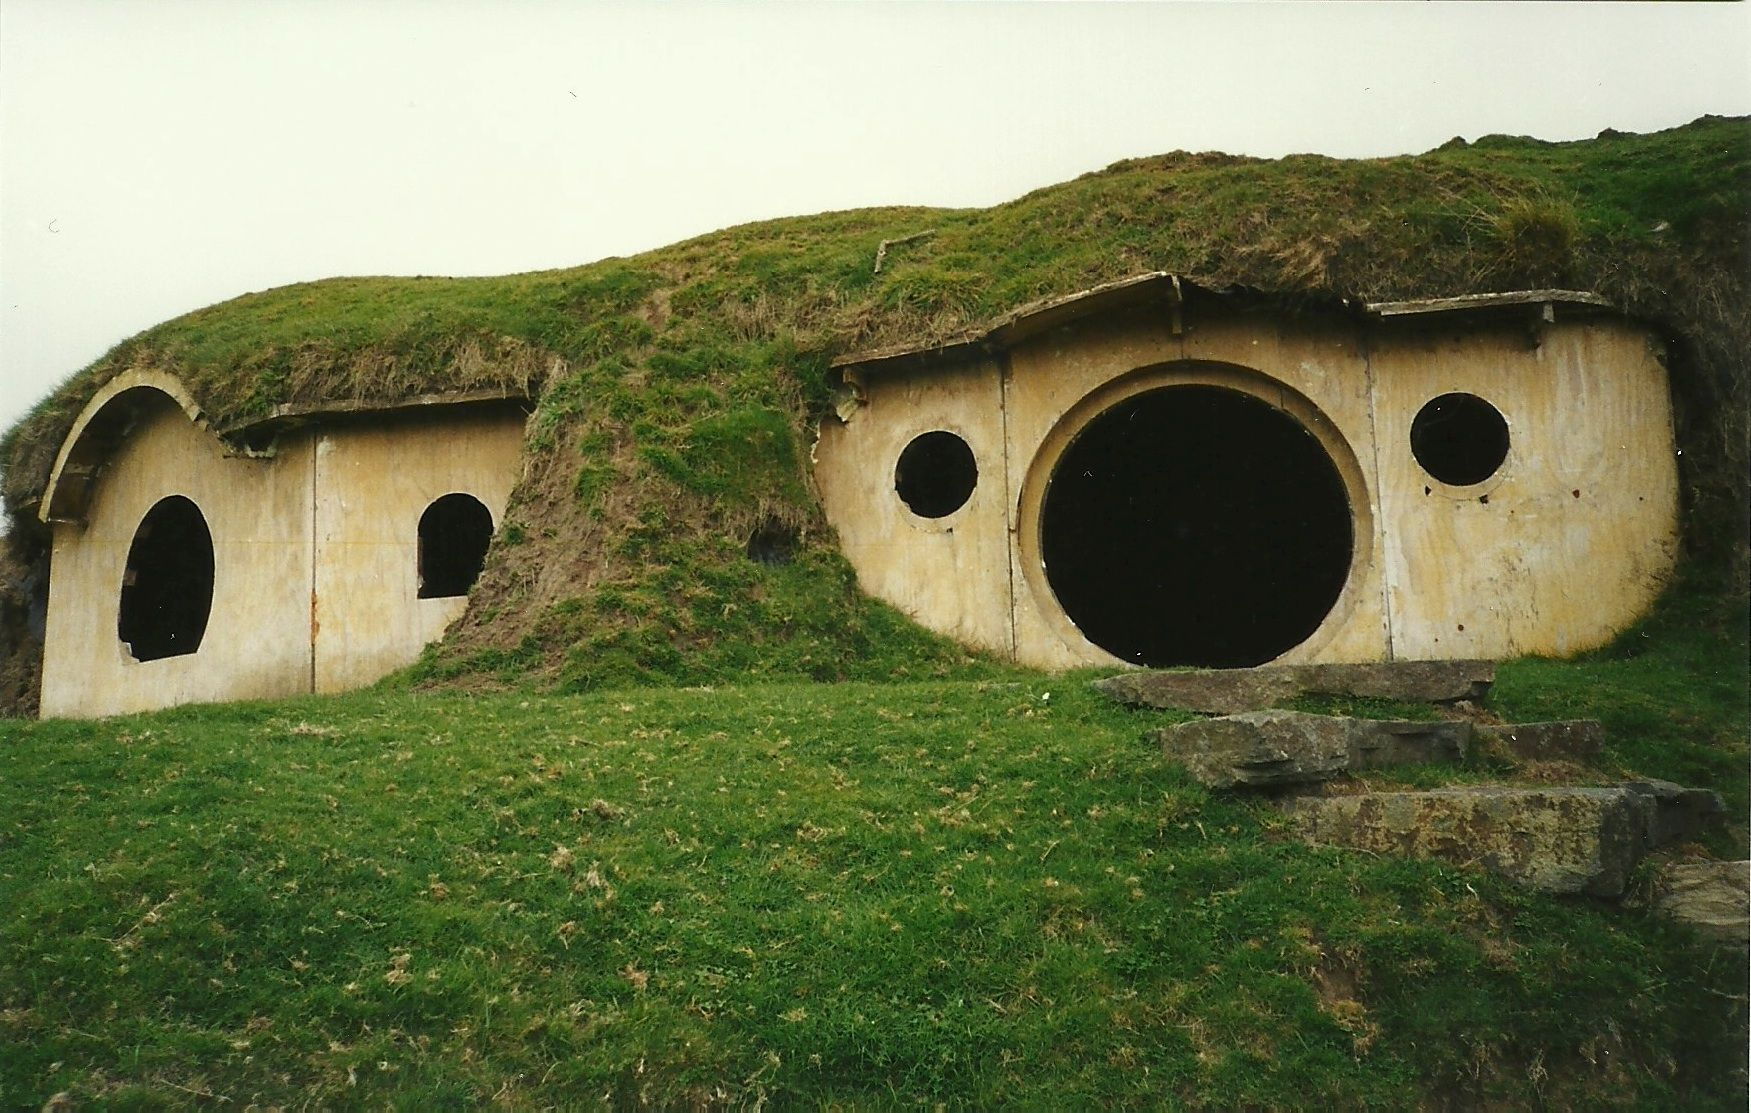 bauruinen hobbit h user houses pinterest hobbit h user hobbit und herr der ringe. Black Bedroom Furniture Sets. Home Design Ideas